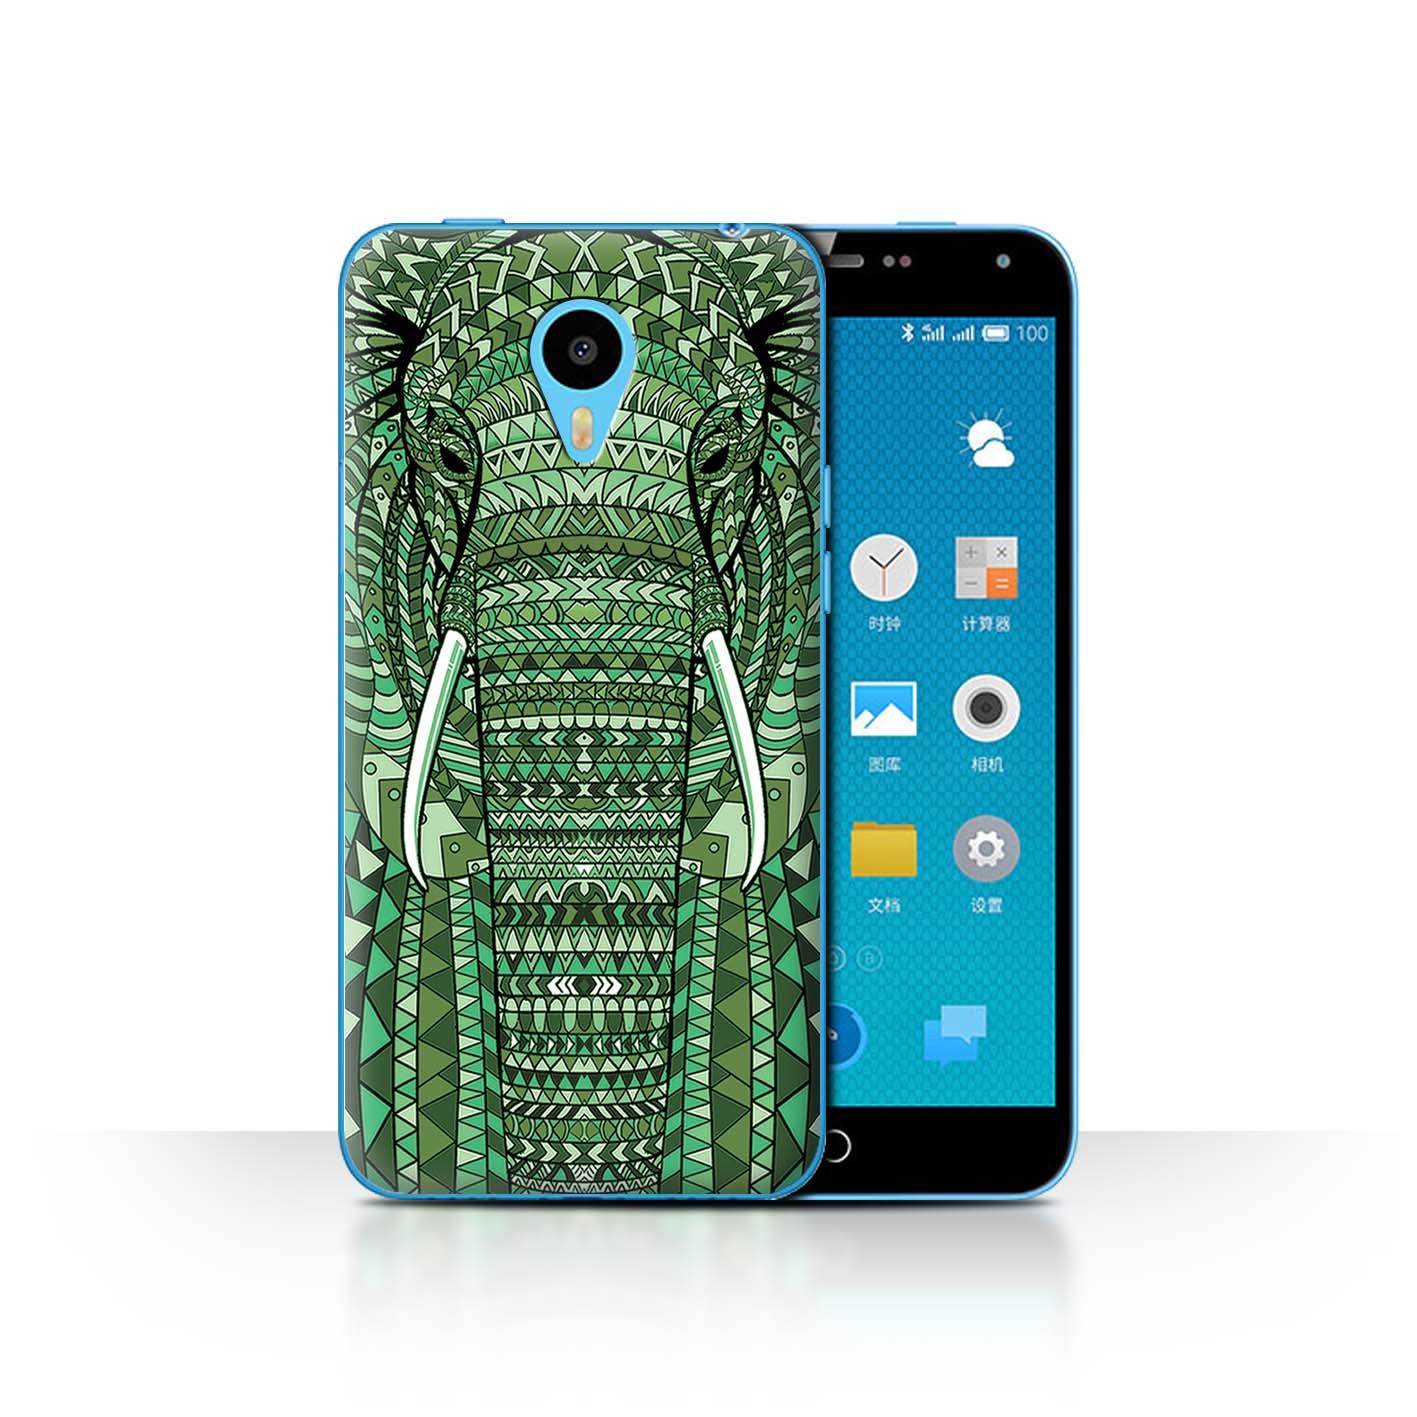 STUFF4-Back-Case-Cover-Skin-for-Meizu-M1N-Aztec-Animal-Design